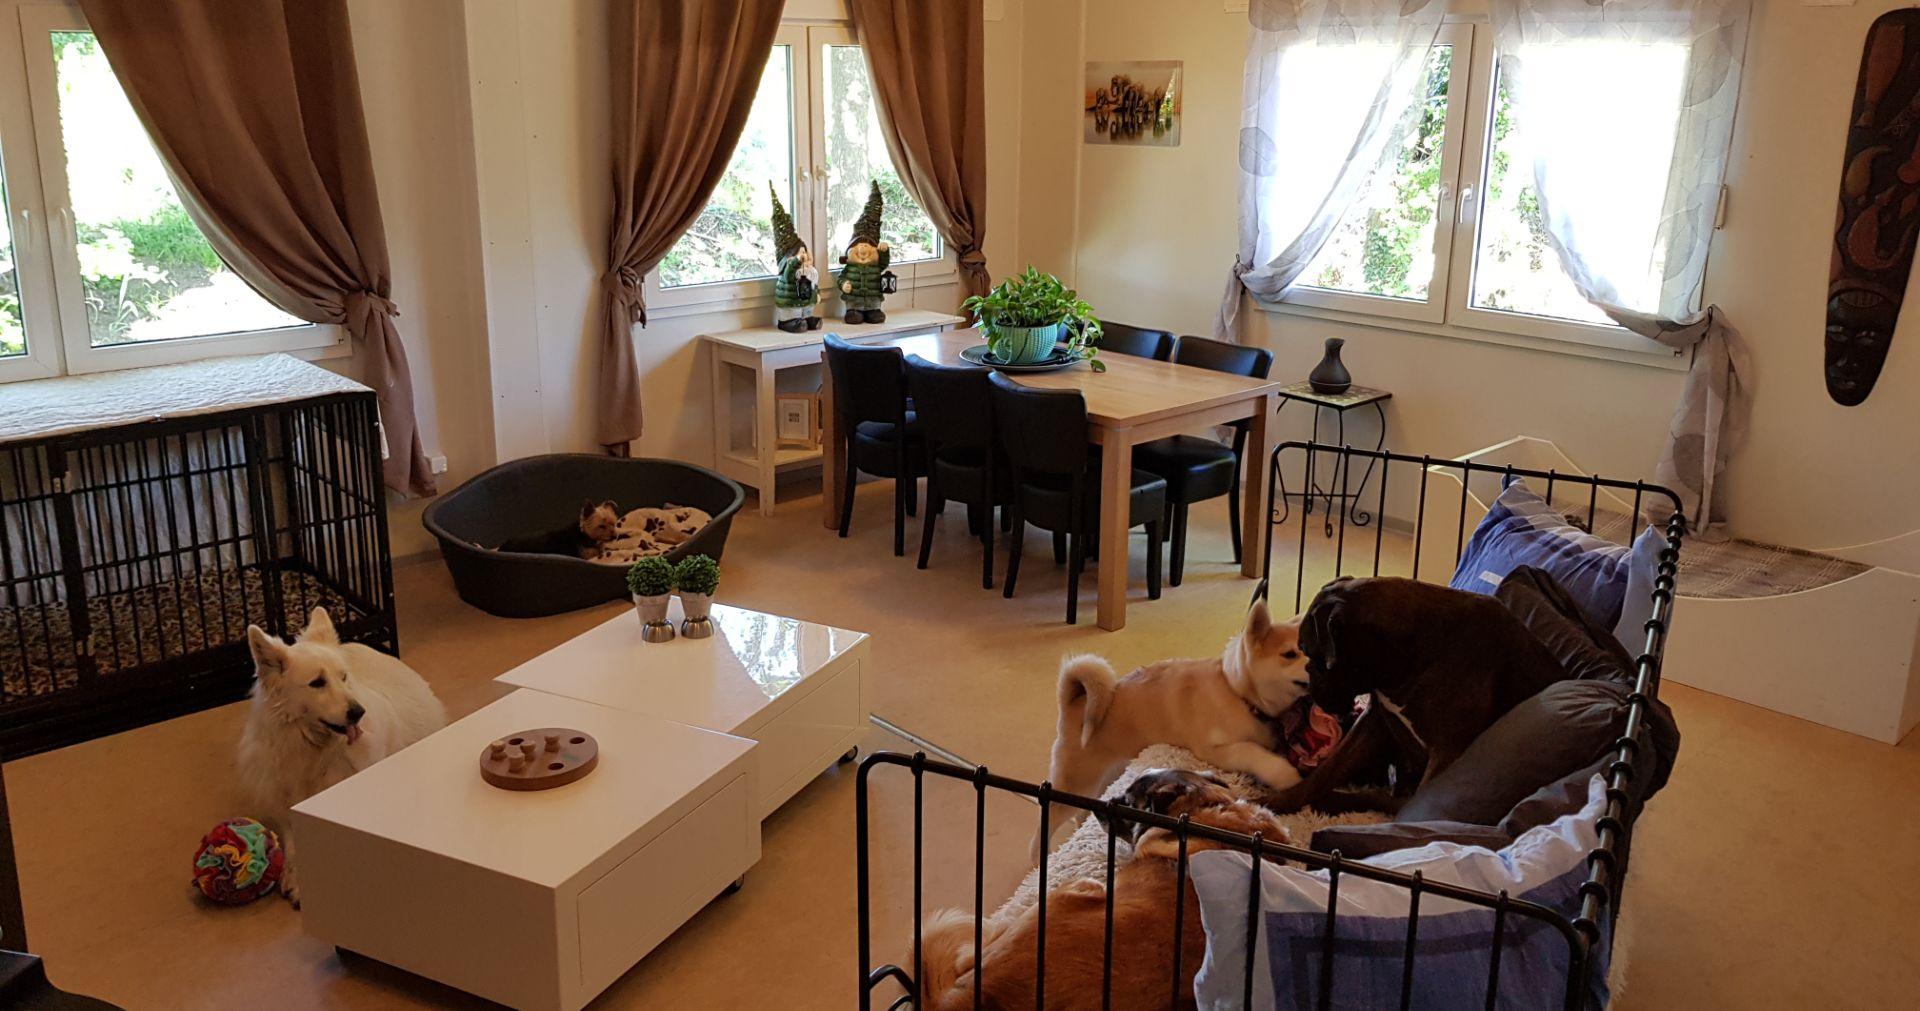 dierenpension huiselijk